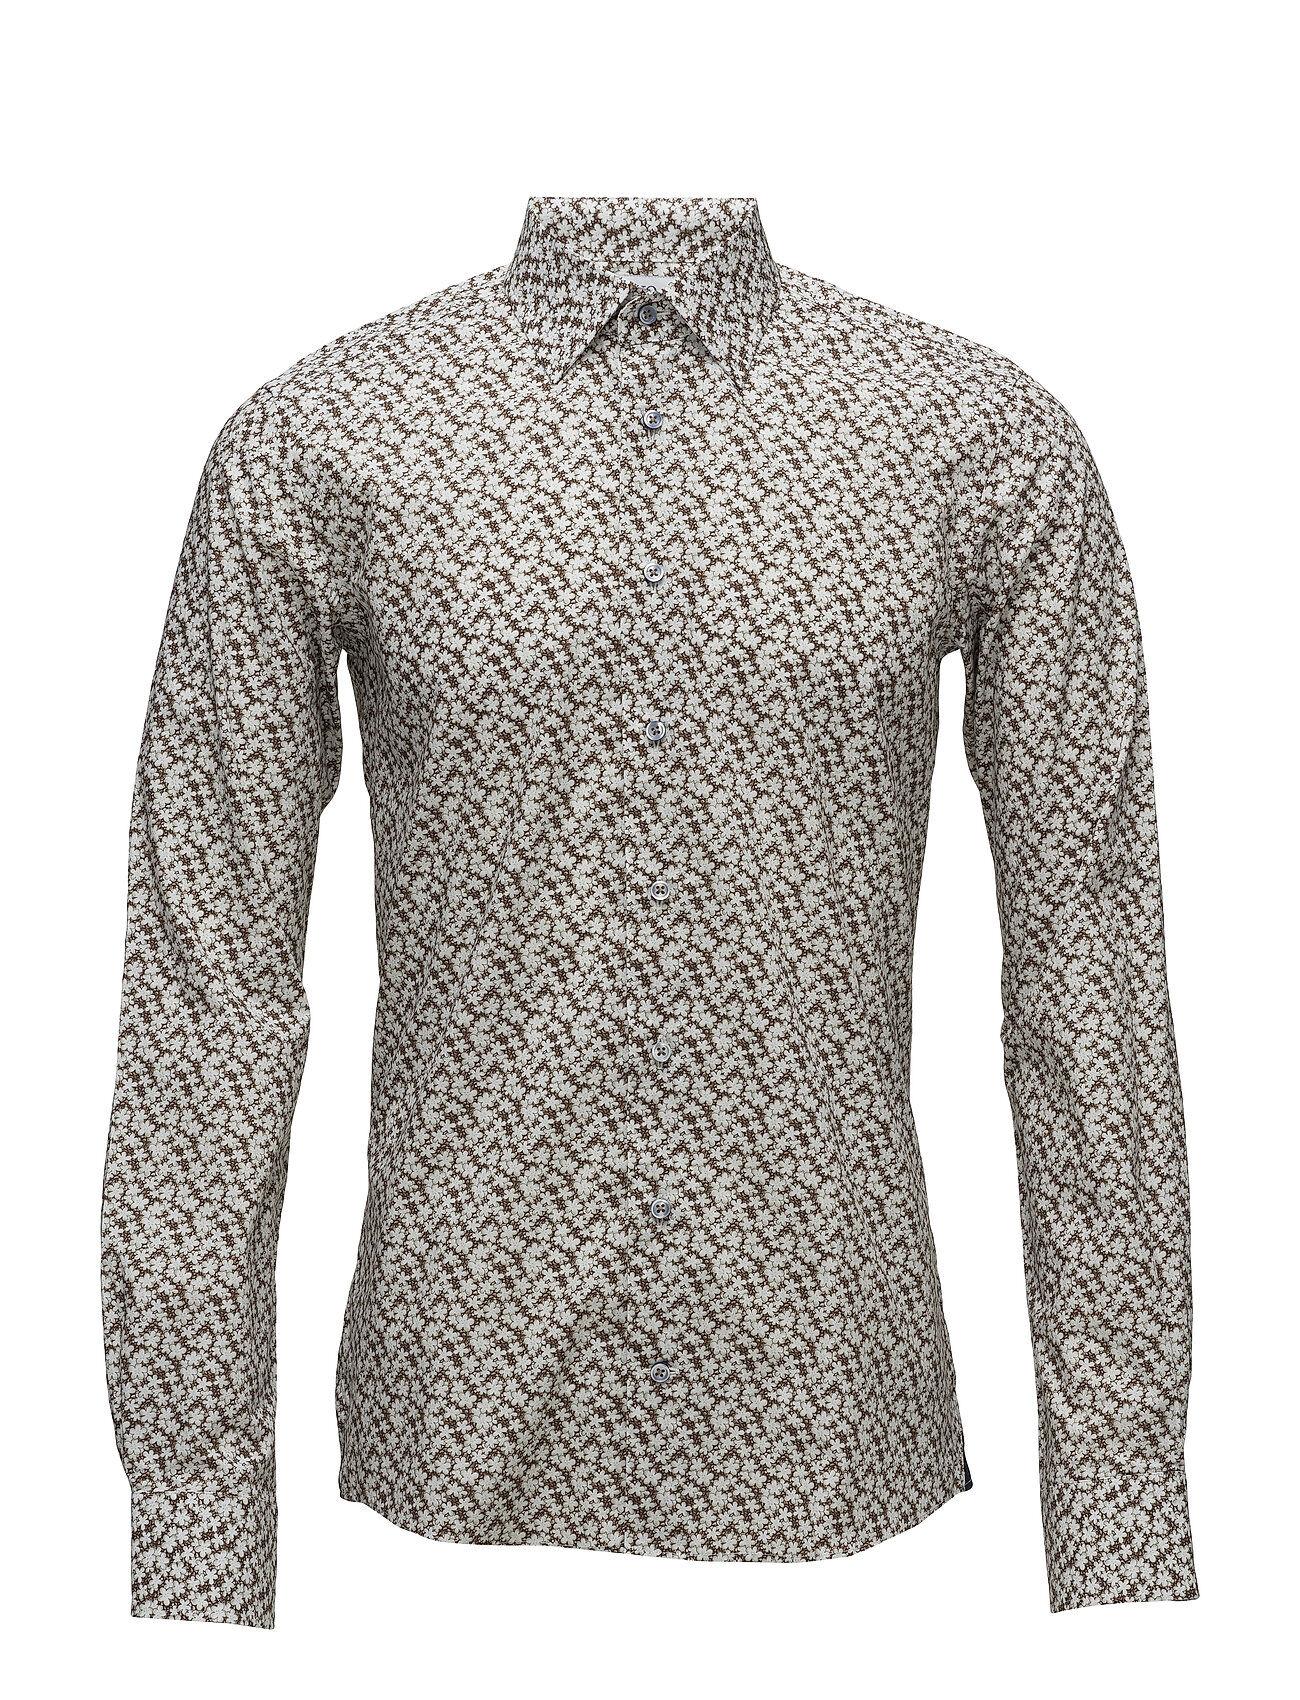 XO Shirtmaker by Sand Copenhagen 8061 - Jake Sc